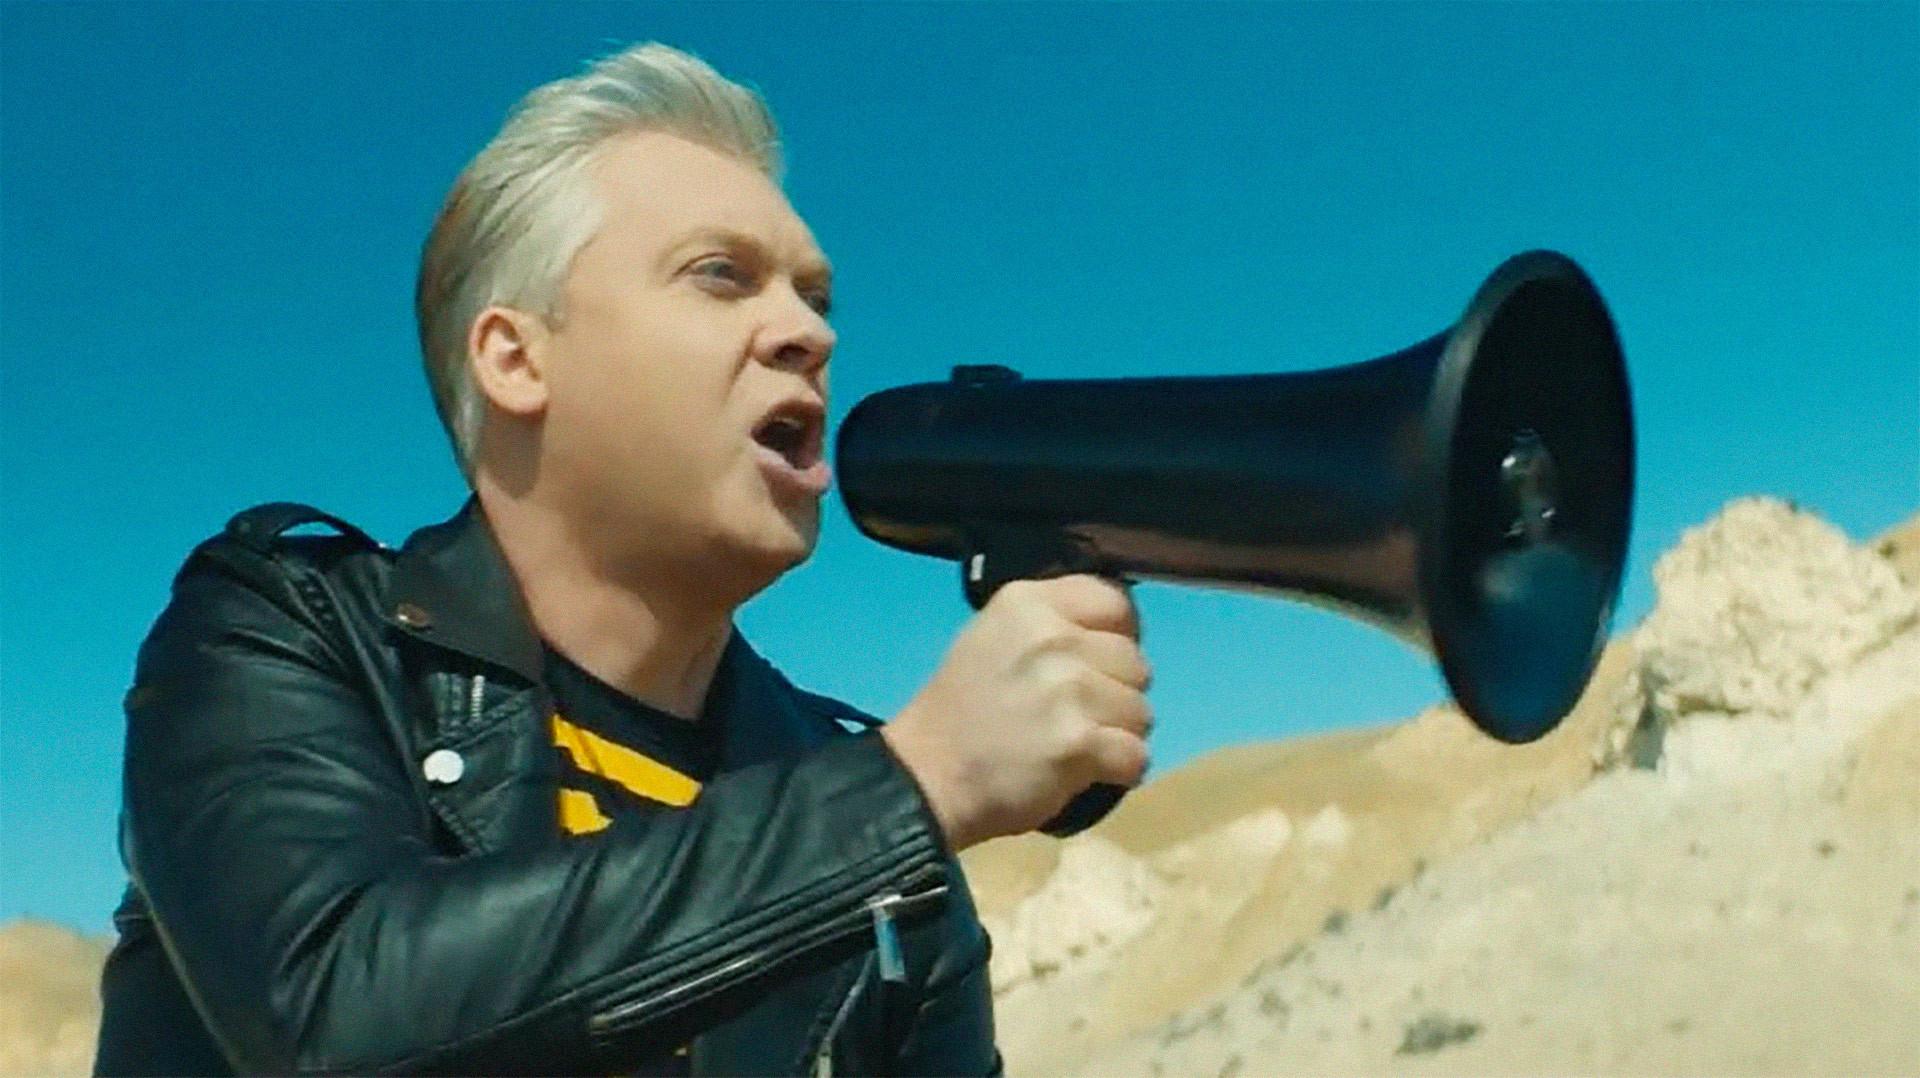 "<p>Кадр <a href=""https://www.youtube.com/watch?v=2QyRK4AmkuY"" target=""_blank"">видео&nbsp;EXPONAT</a></p>"